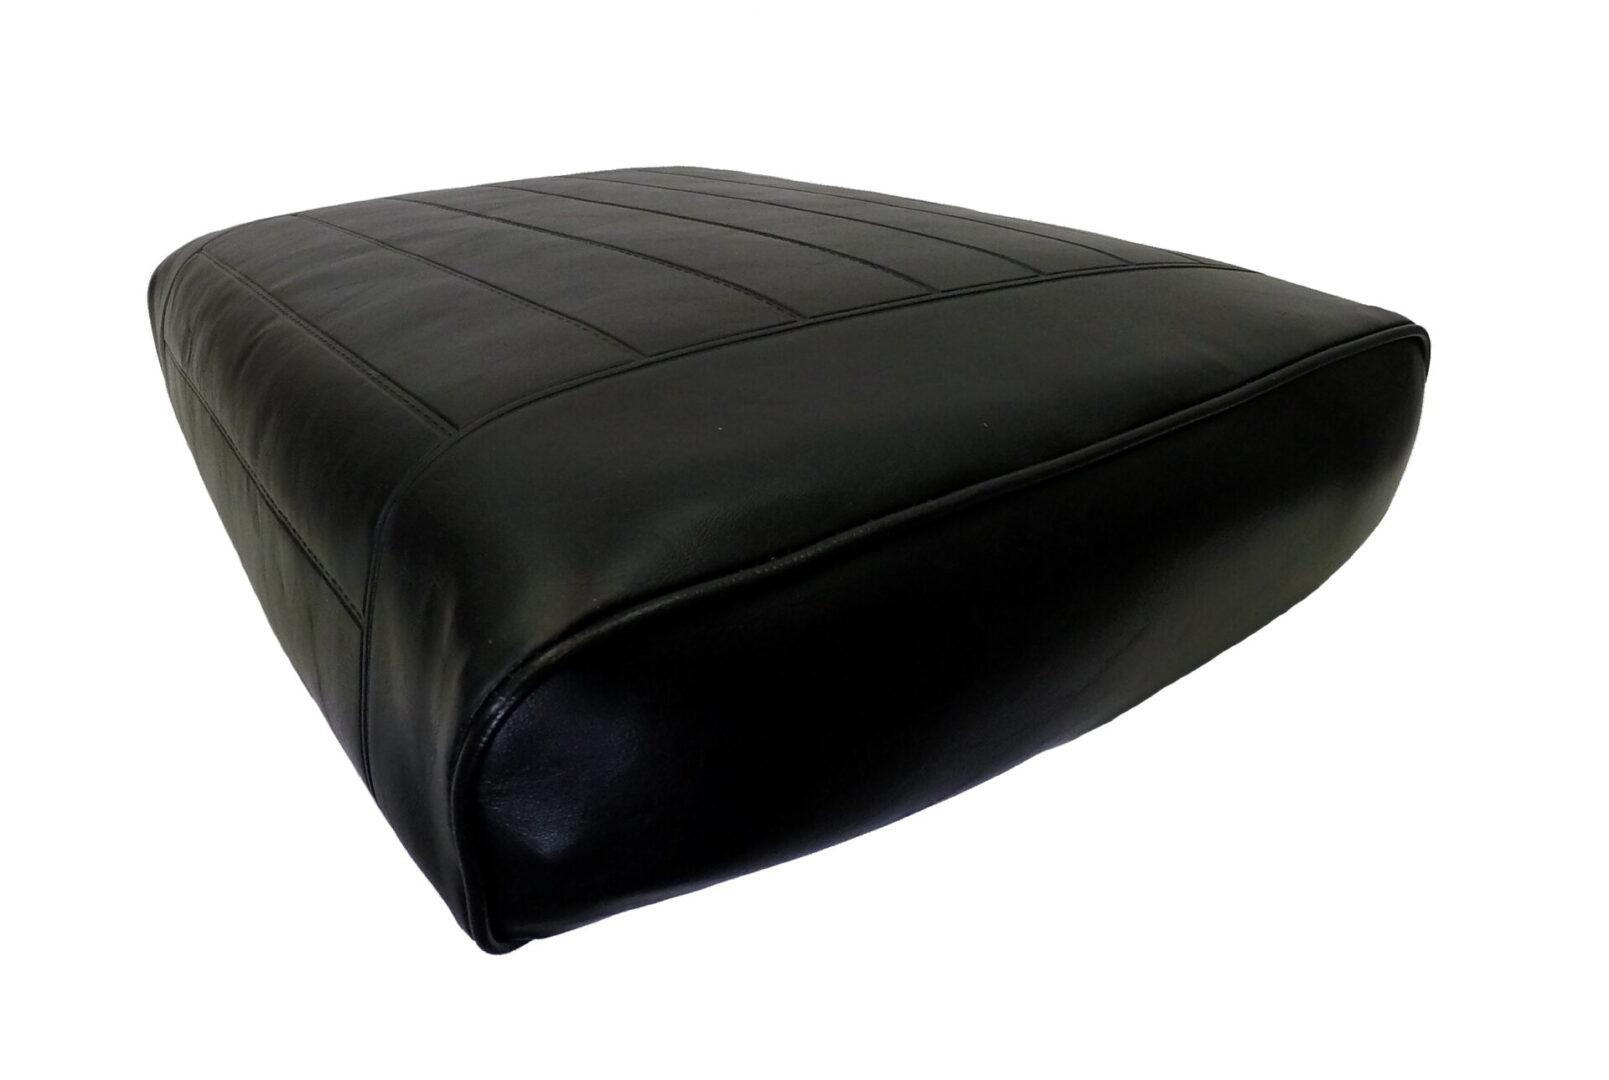 CCS DLX BTM FRT CRN - Comfy Coil Deluxe Bottom Cushion